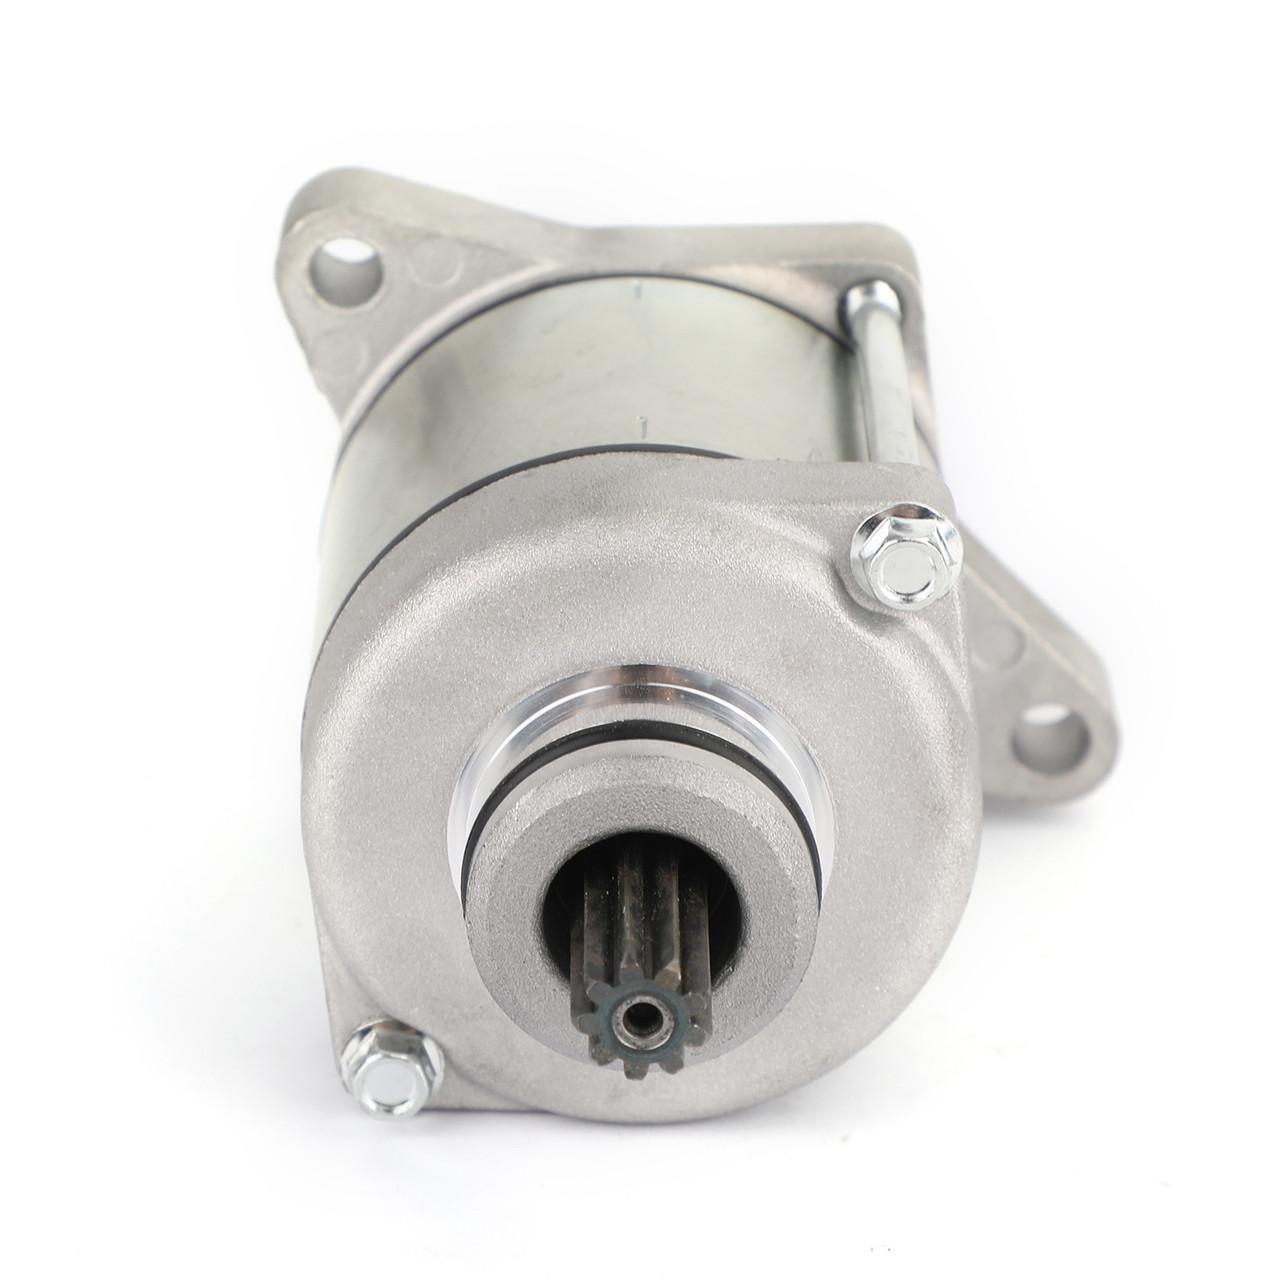 STARTER Motor Engine Starting 9-Spline Fit For 300 XC W TPI  Six Days 19-20 Husqvarna TX300 TE300 TE250i 17-18